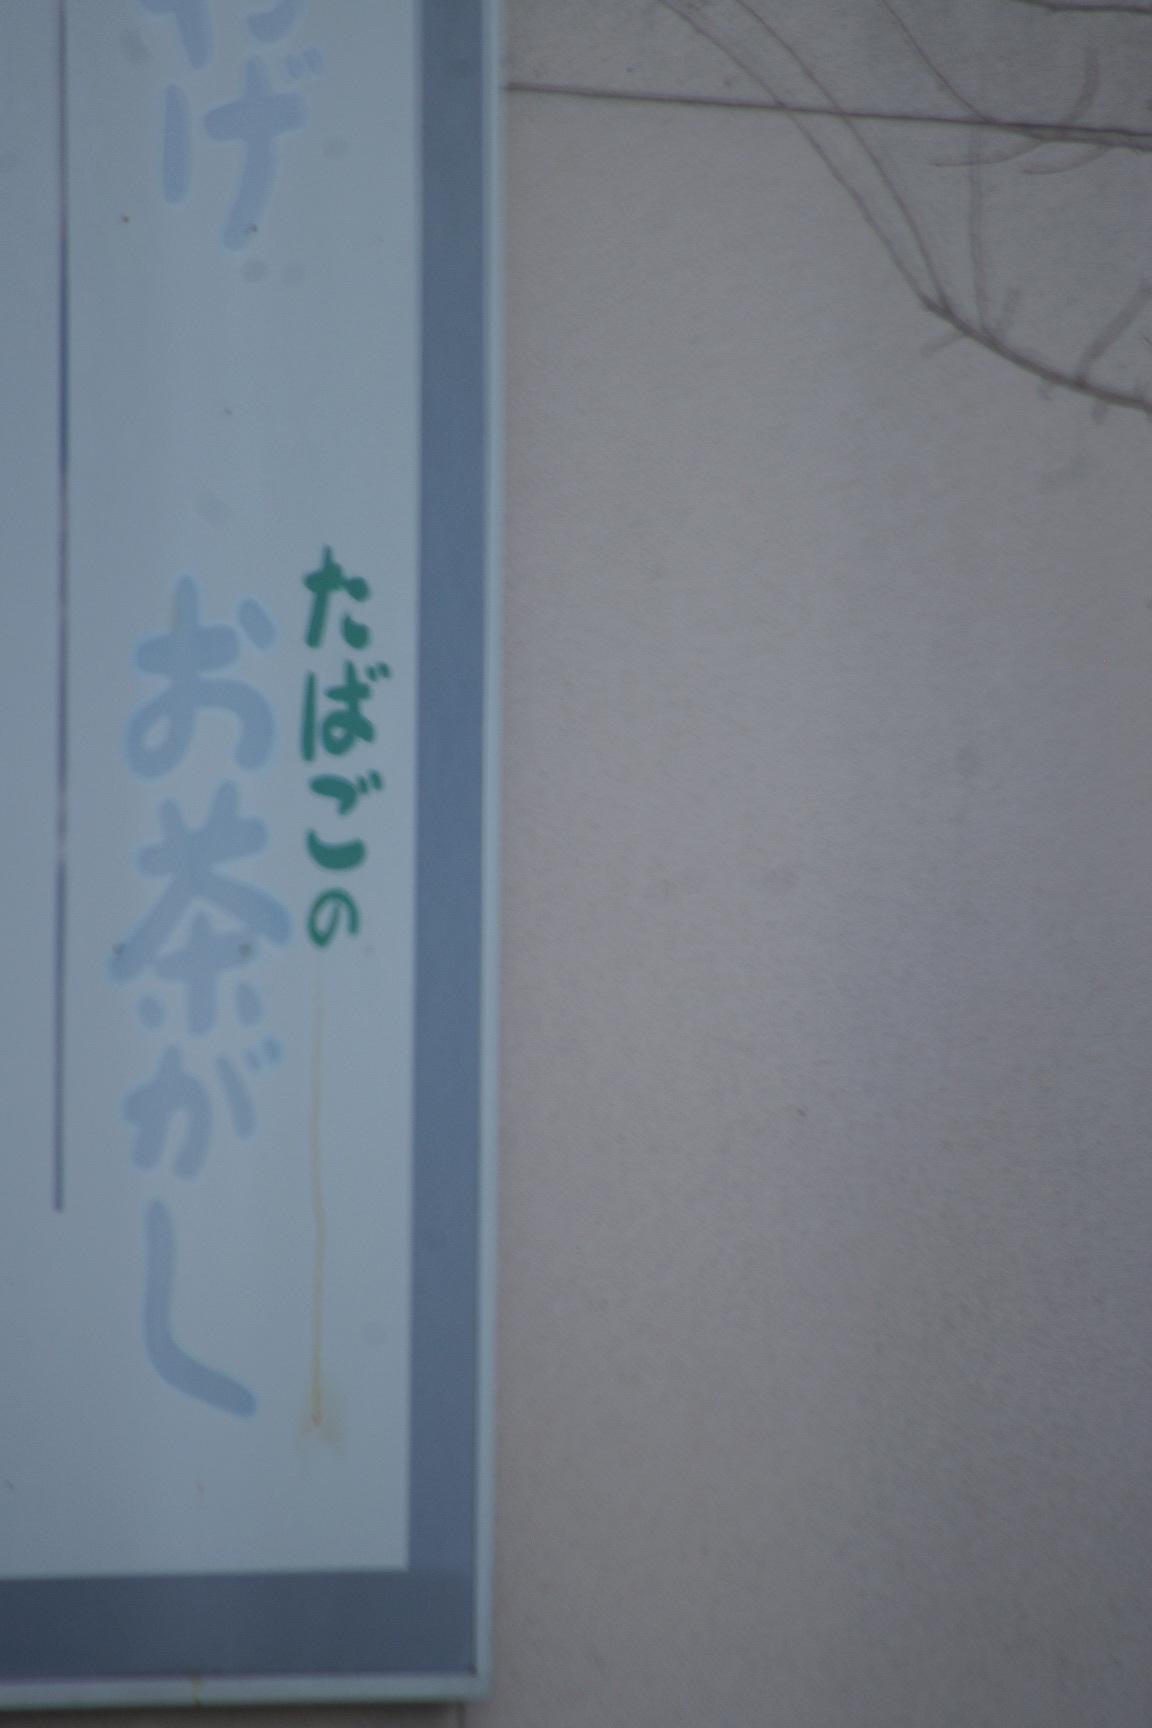 c0337494_16045910.jpg